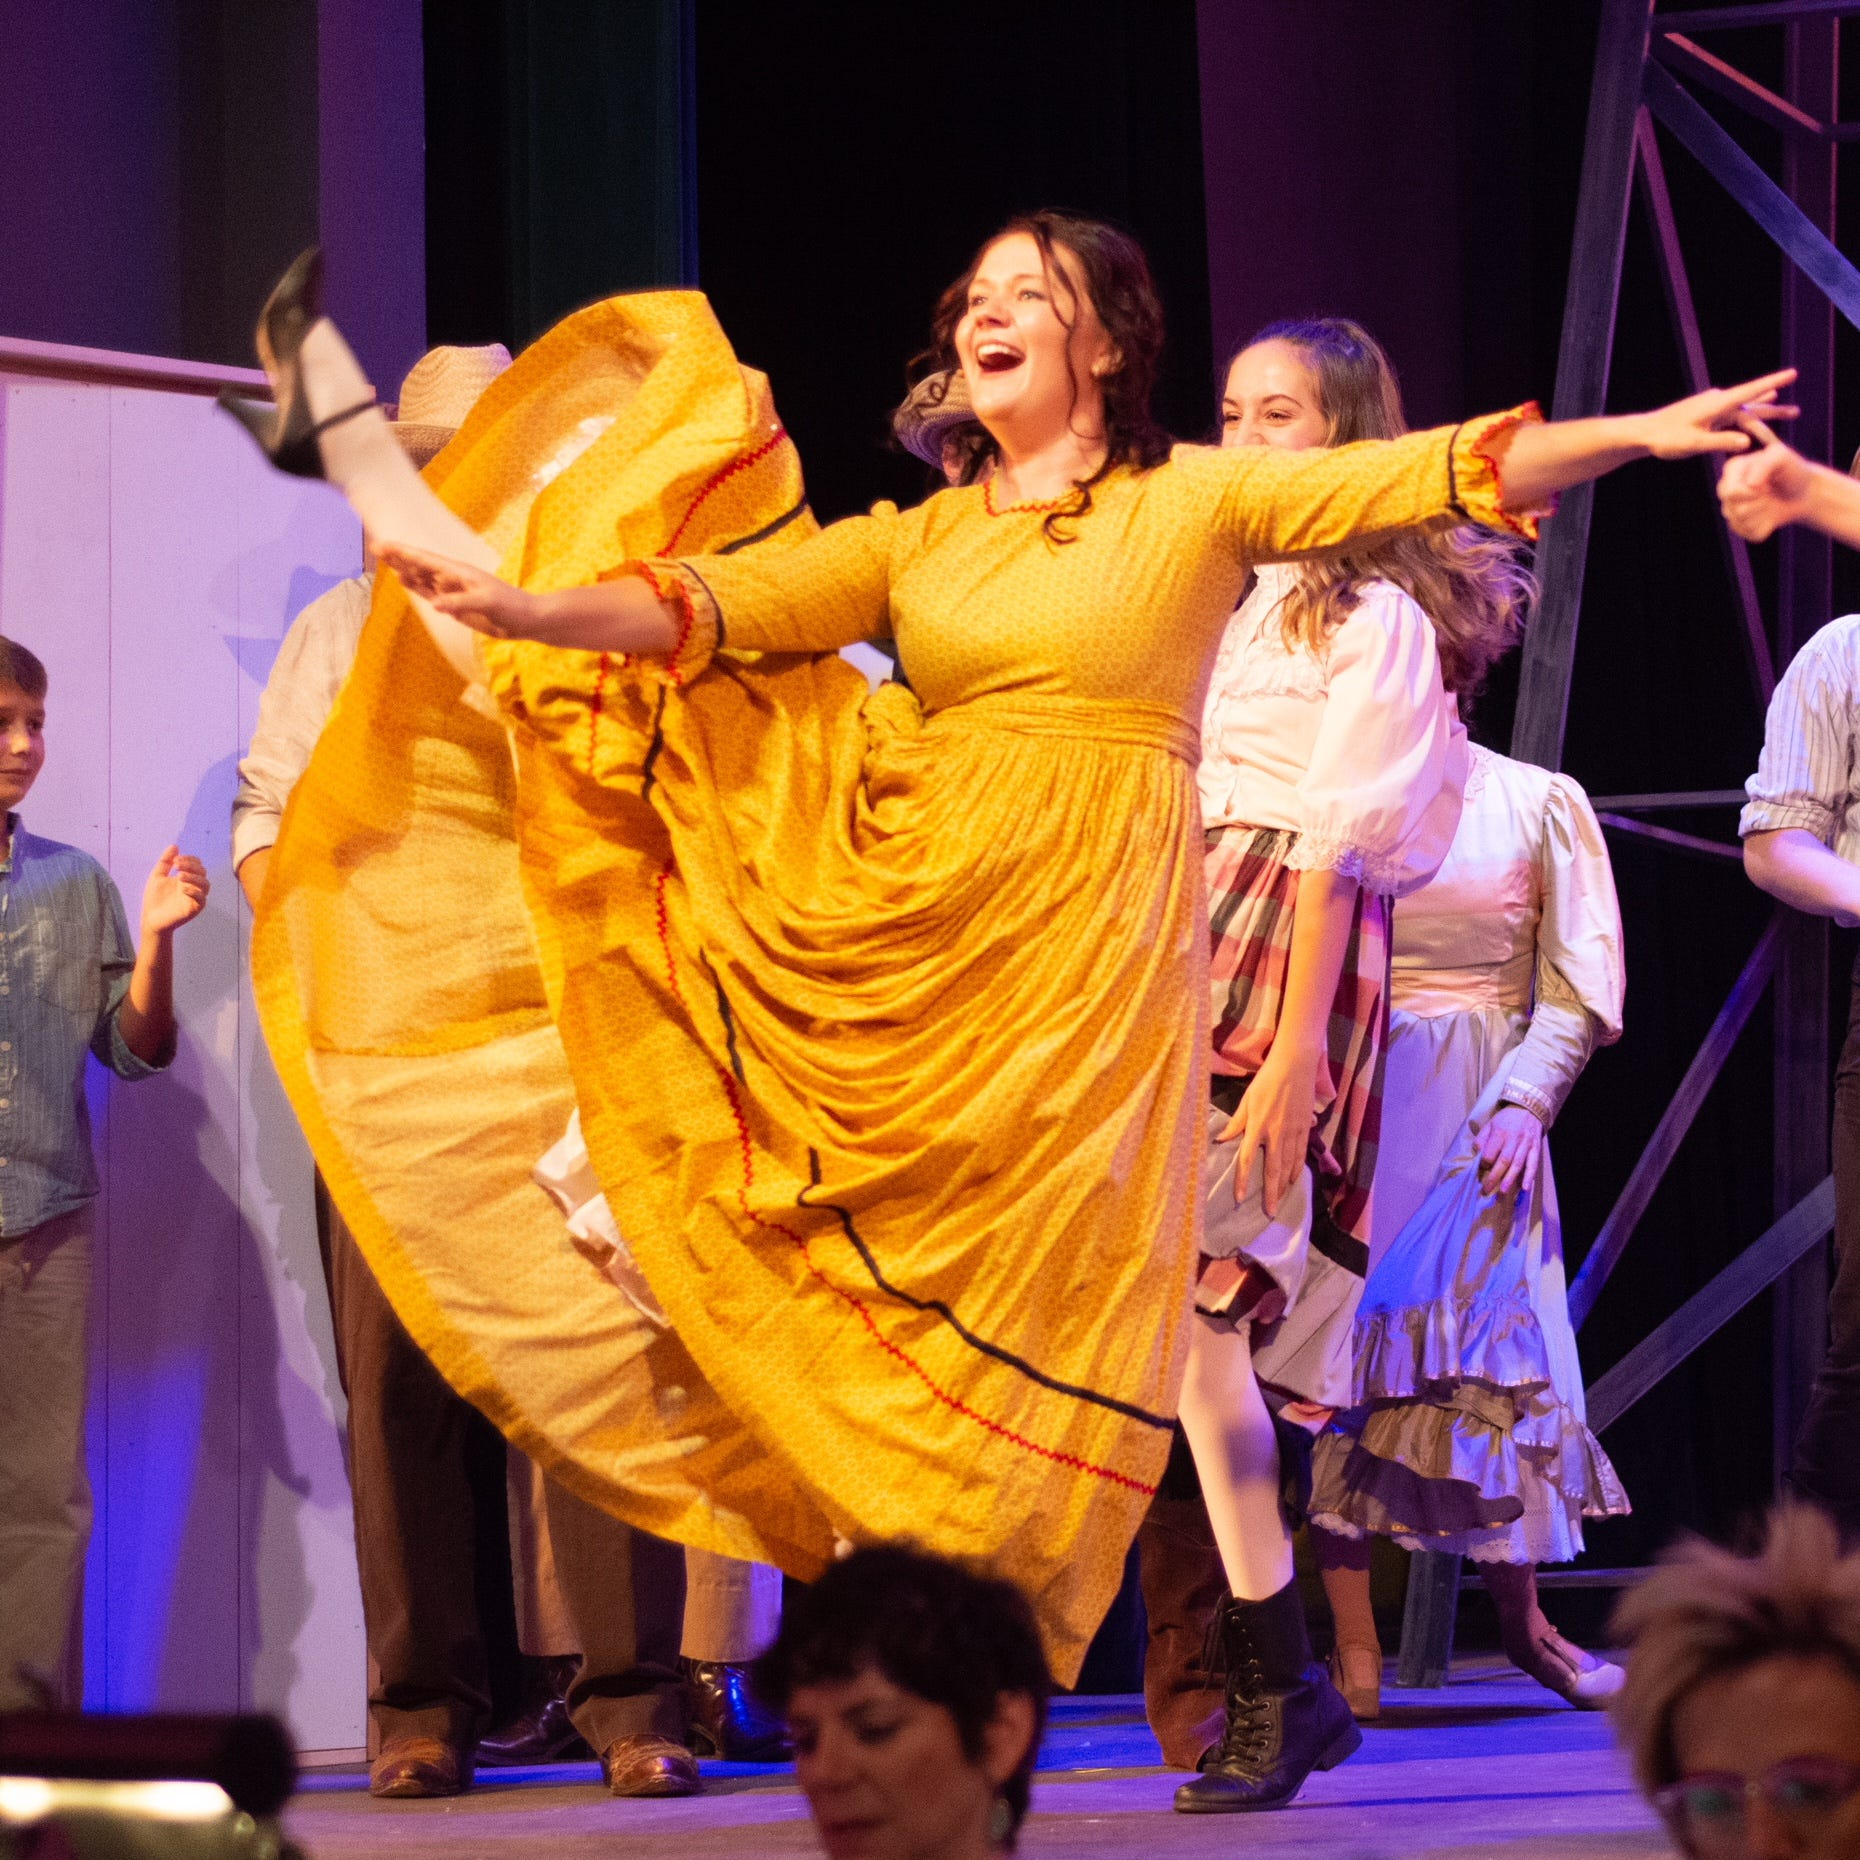 On stage: 'West Side Story,' High Street Broadcast, George Christie, Jo Koy